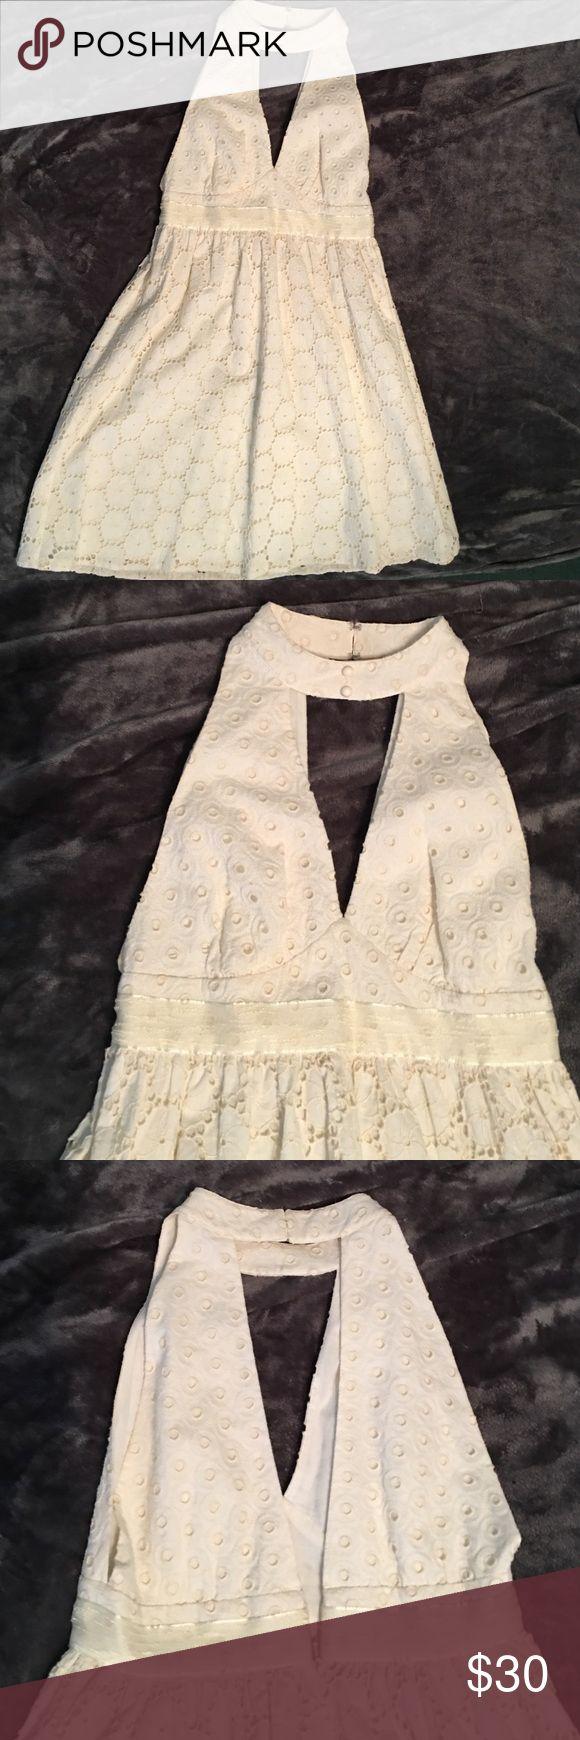 GORGEOUS ANNA SUI EYELET DRESS 6 Gorgeous! 100% cotton with 100% cotton lining. Size 6. Anna Sui Dresses